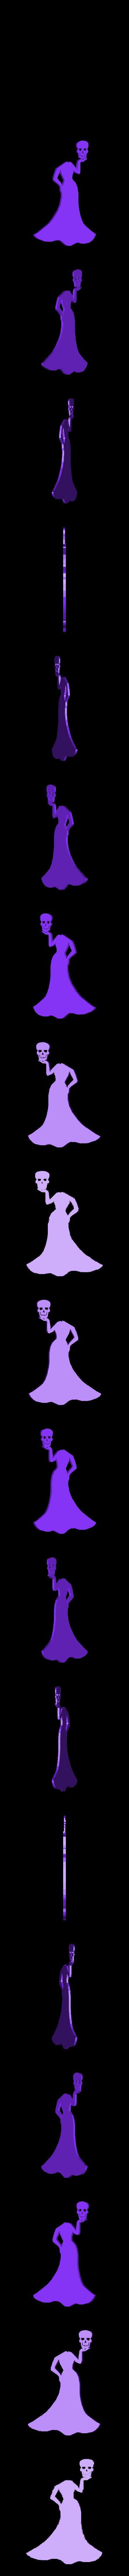 princesse sans tête.stl Download STL file Halloween (full of wall decoration) • 3D print model, catf3d